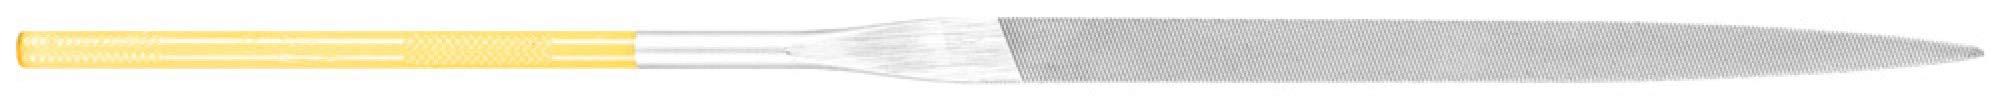 PFERD 15201 7'' CORINOX Needle File for Stainless Flat Shape, Cut 0 (12pk)